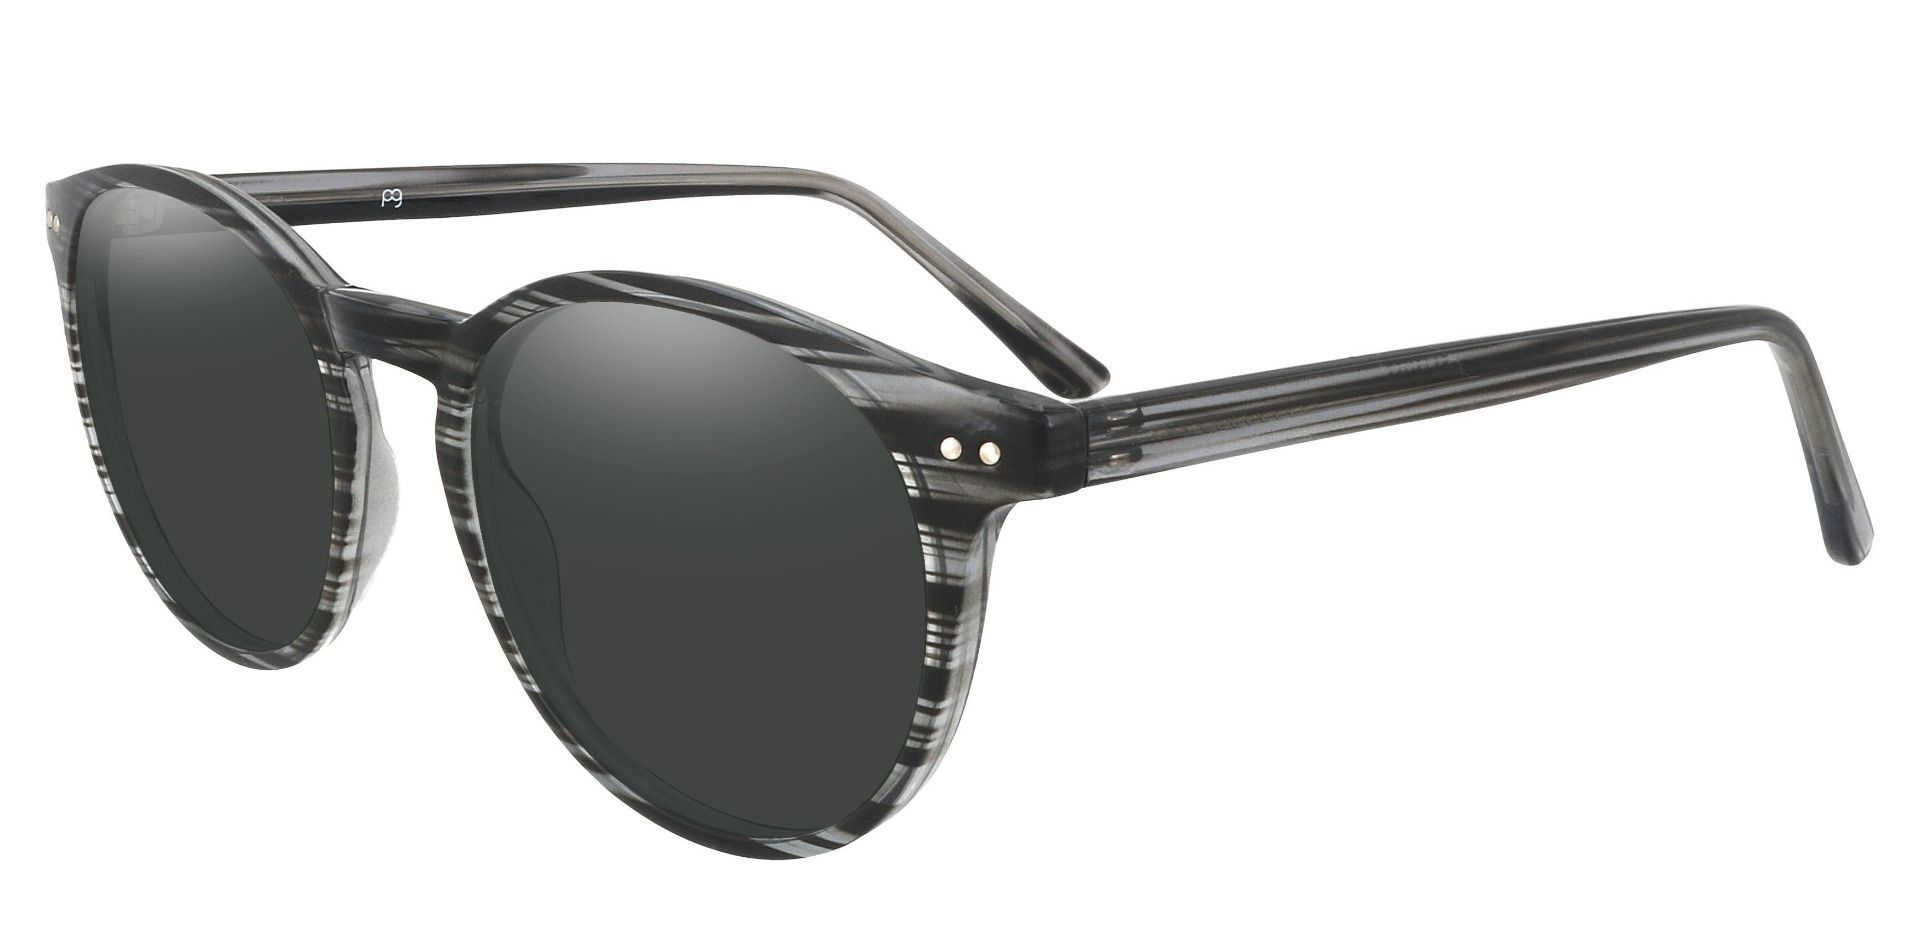 Dormont Round Prescription Sunglasses - Black Frame With Gray Lenses